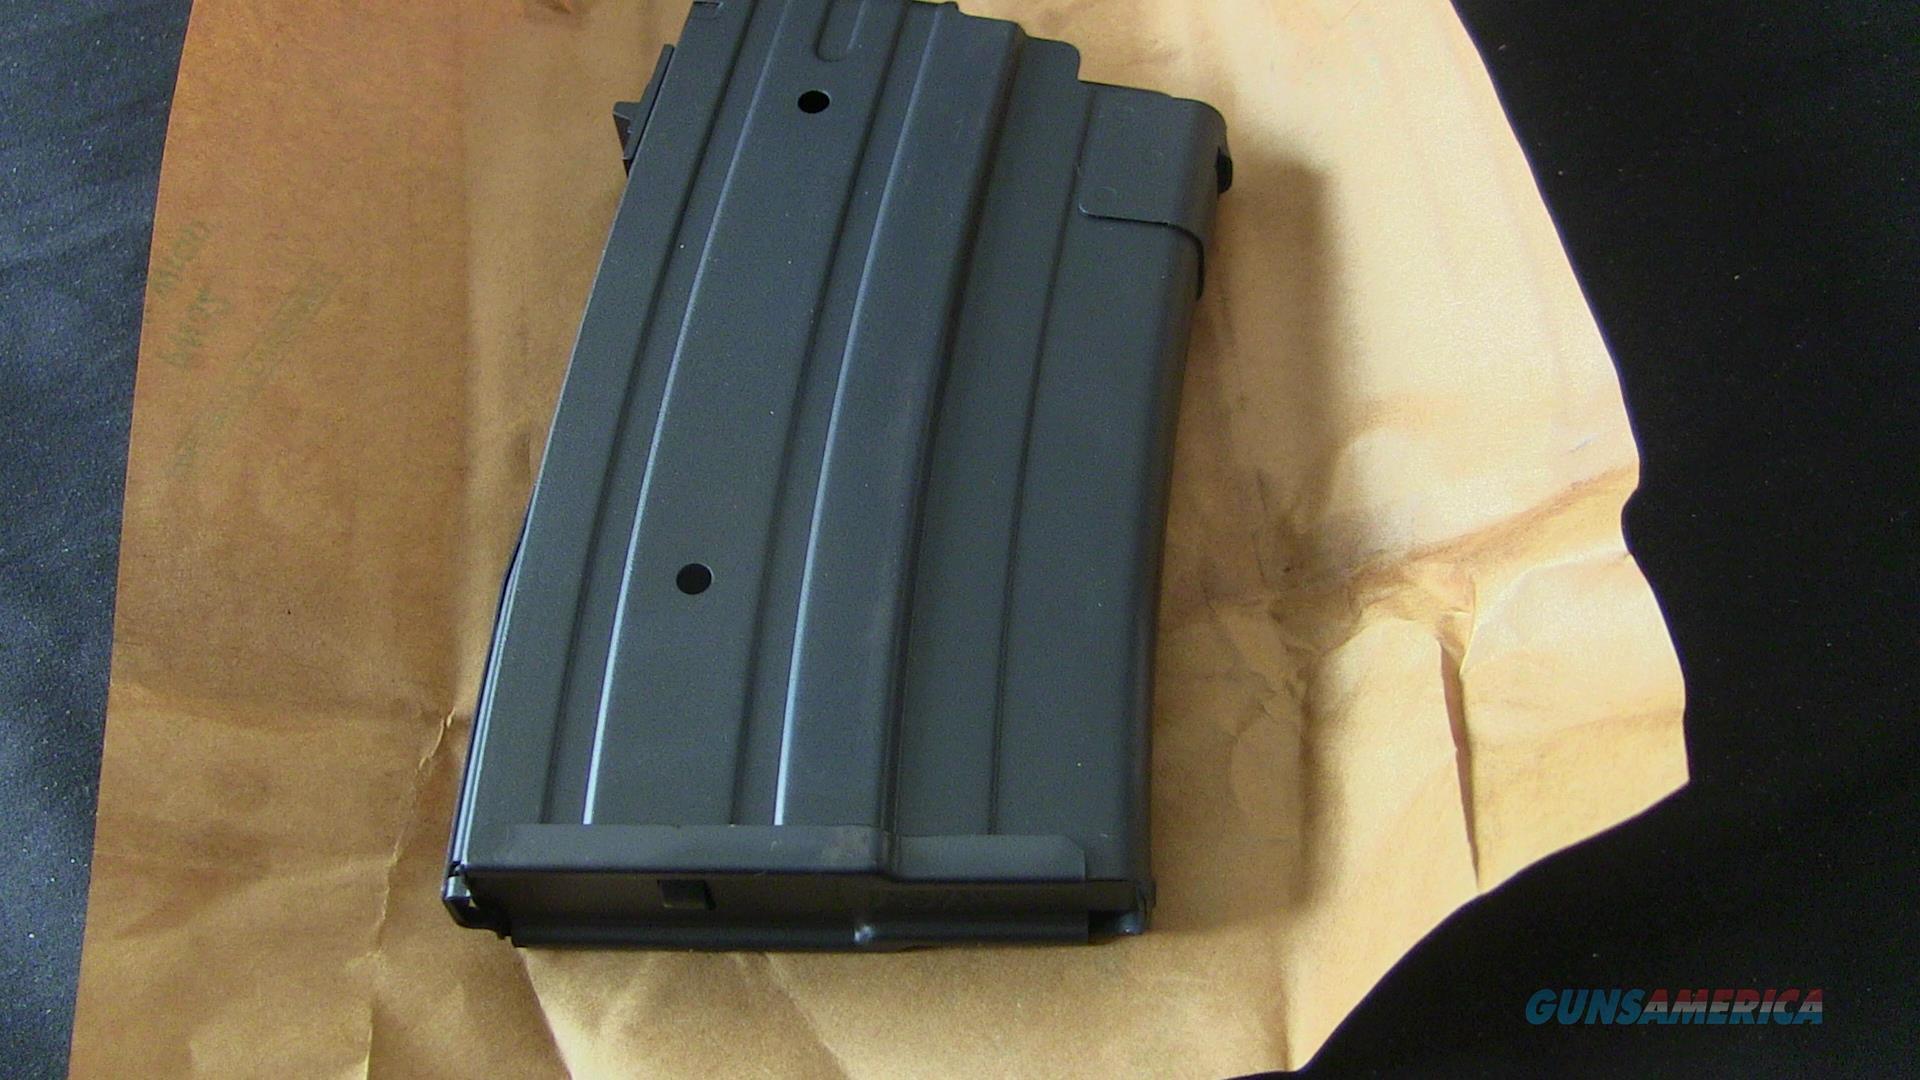 VEPR 30-06 20RD MAGAZINE   Non-Guns > Magazines & Clips > Rifle Magazines > AK Family